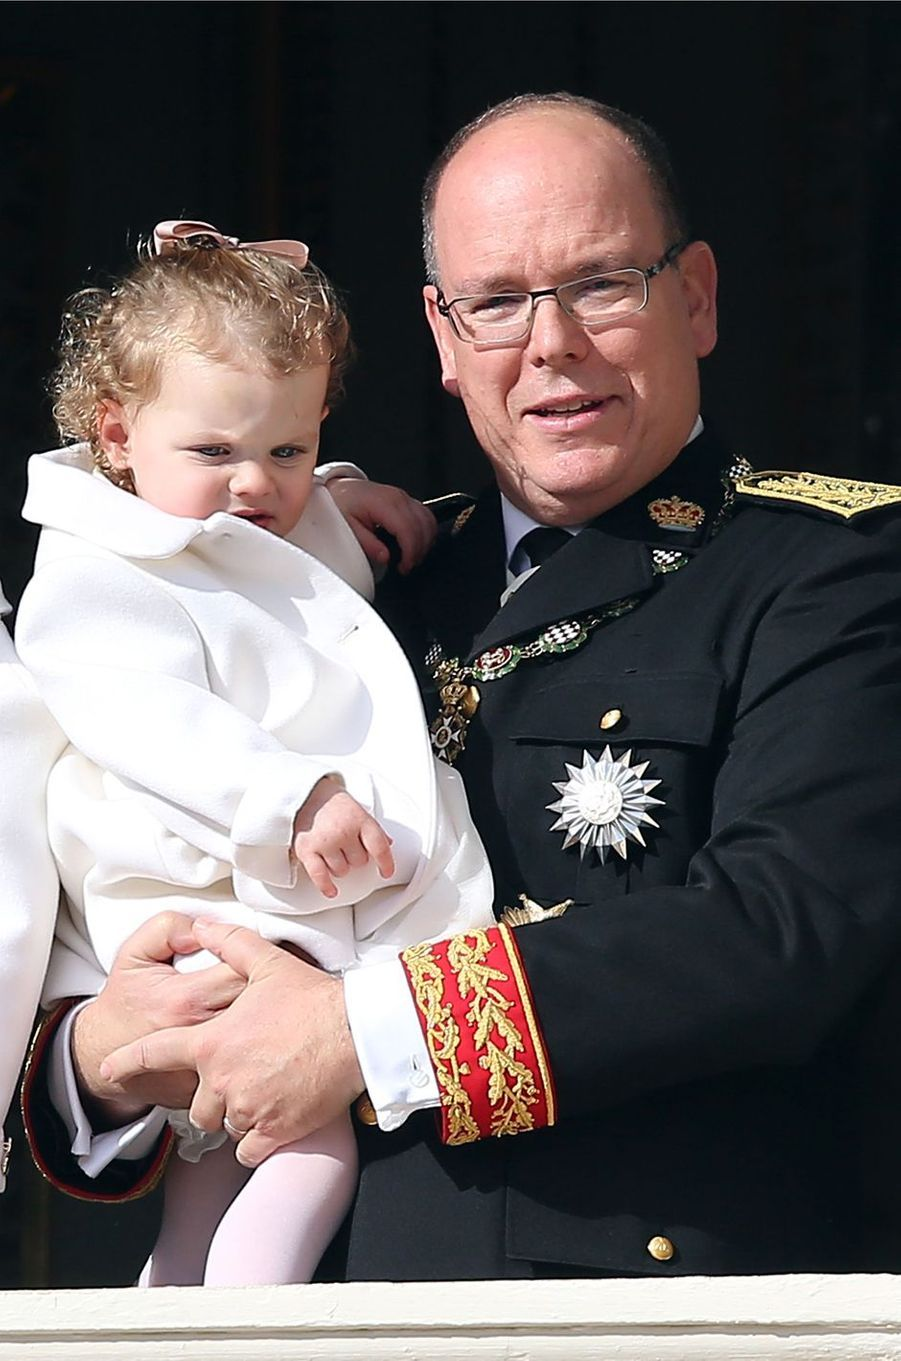 La princesse Gabriella dans les bras du prince Albert II de Monaco à Monaco le 19 novembre 2016